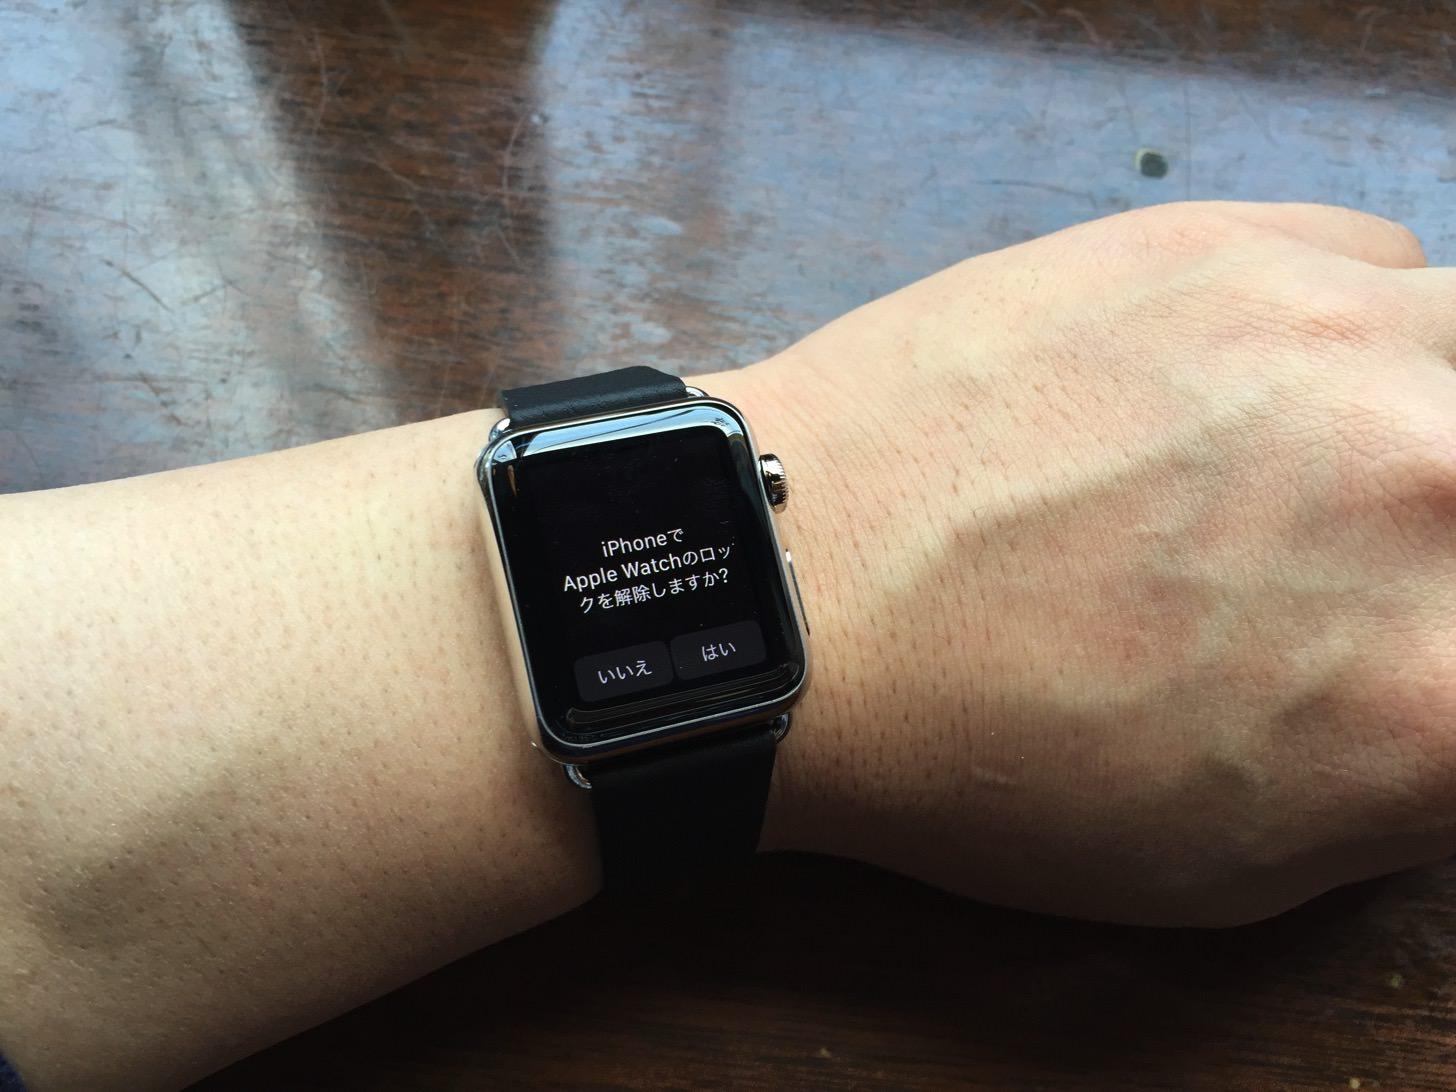 iPhoneでApple Watchのロックを解除する?